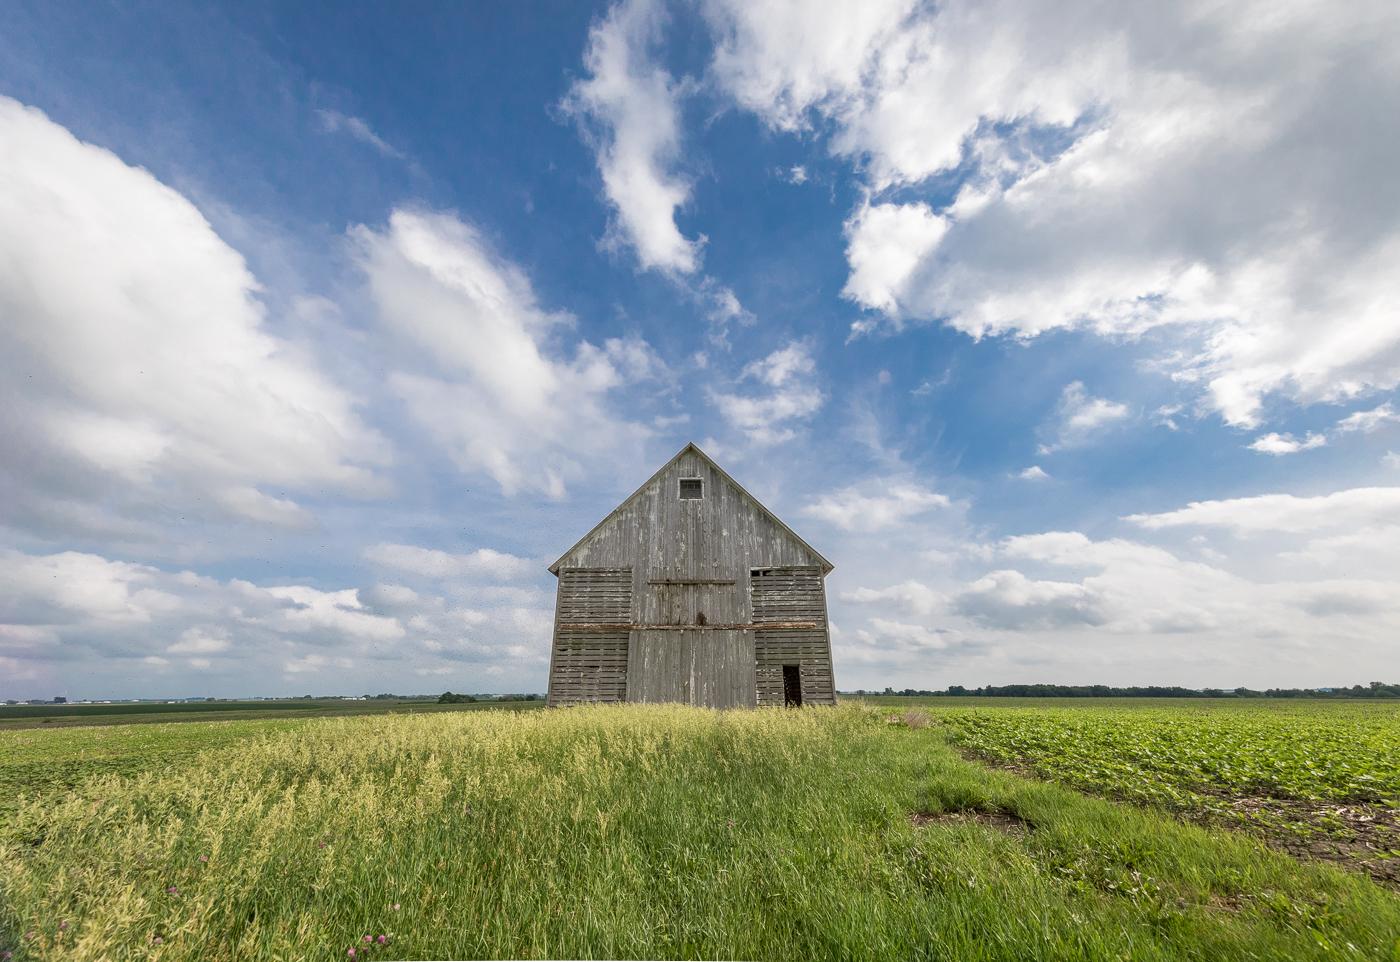 Corn crib, soybean fields, and summer sky